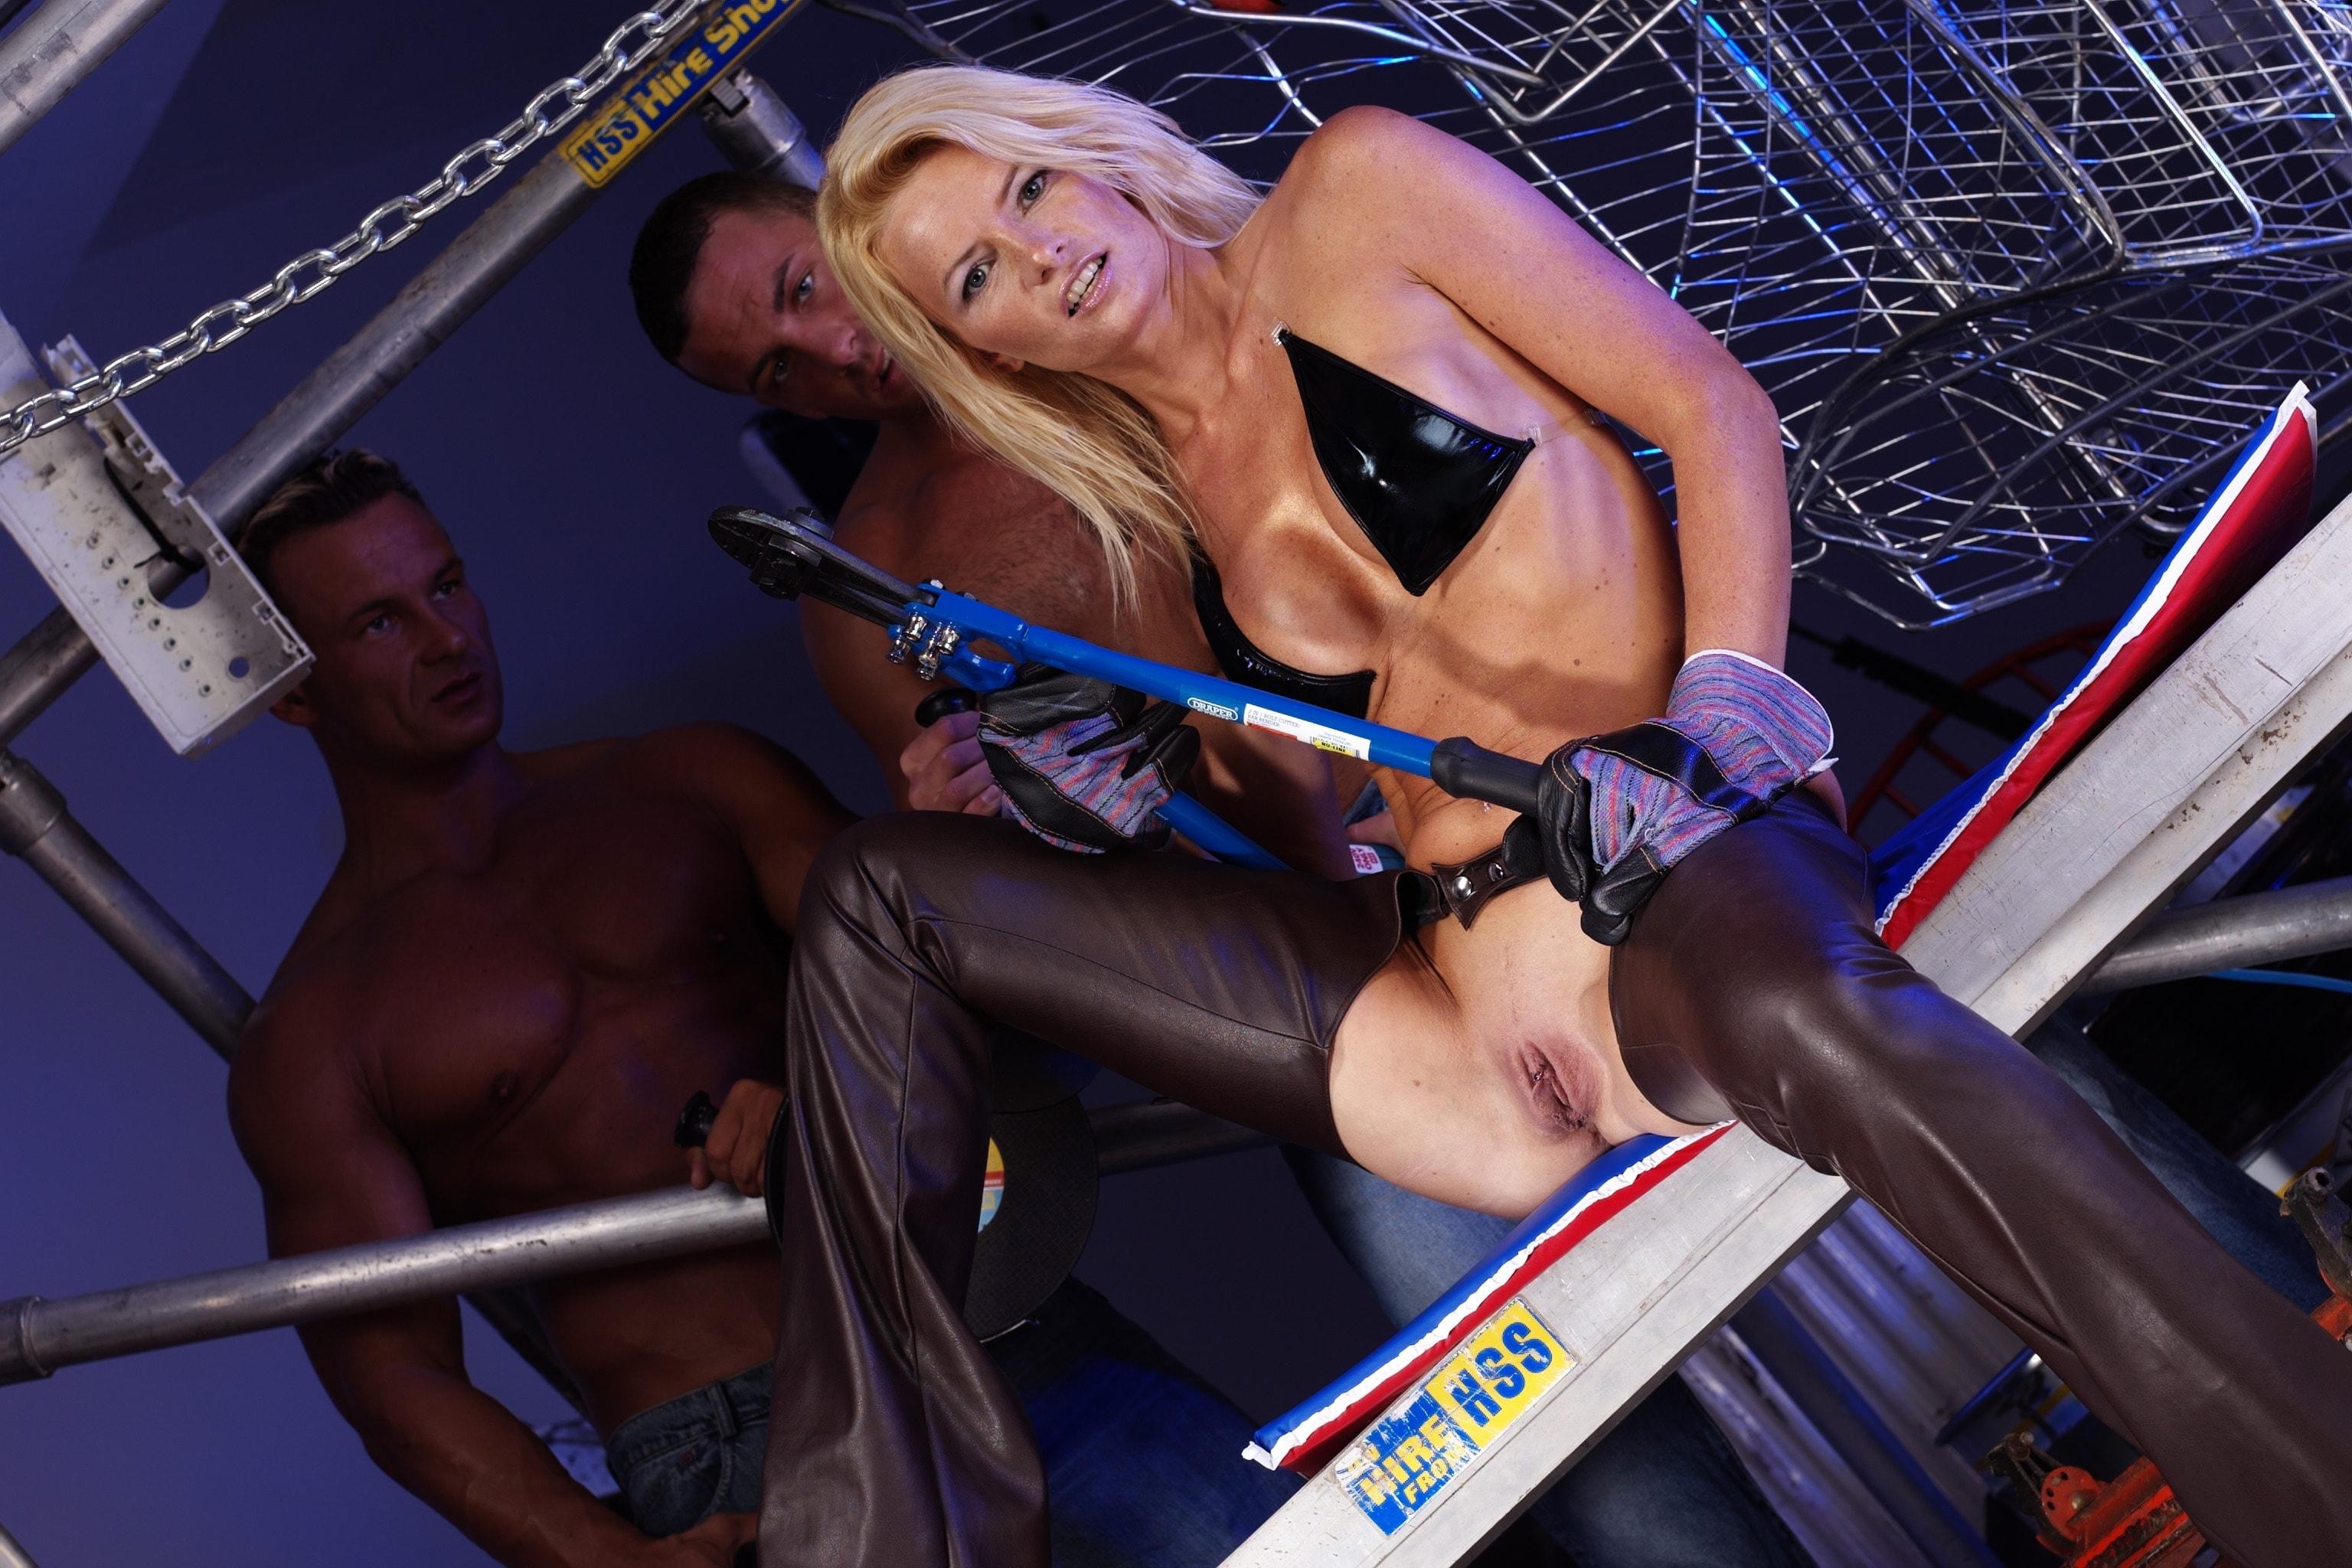 seks-posle-striptiza-smotret